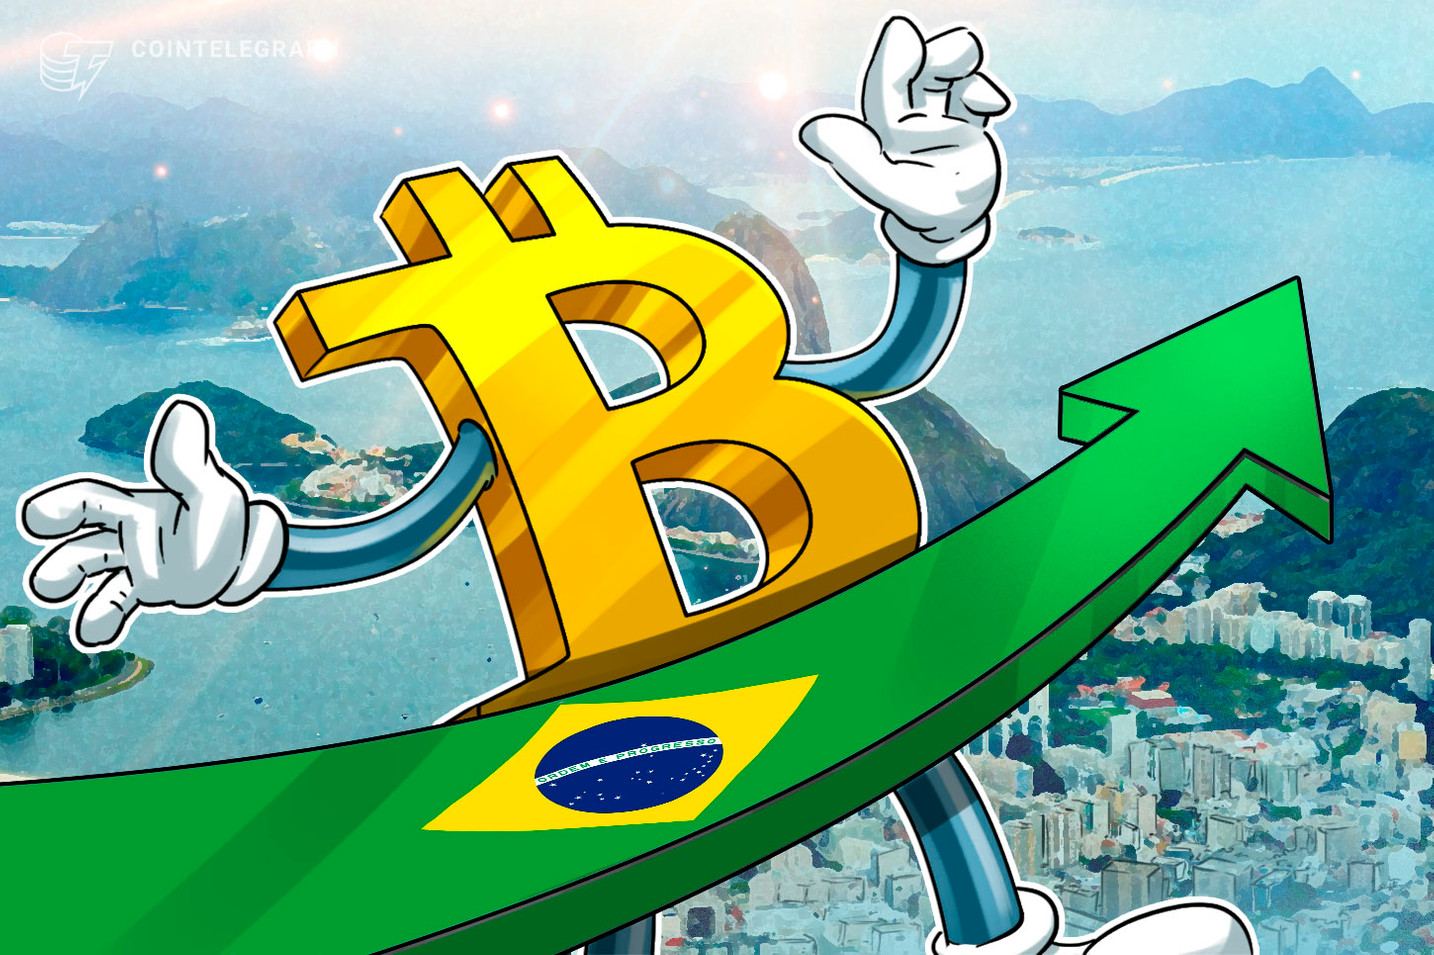 Crise do coronavírus faz demanda por Bitcoin disparar 190% em exchanges do Brasil